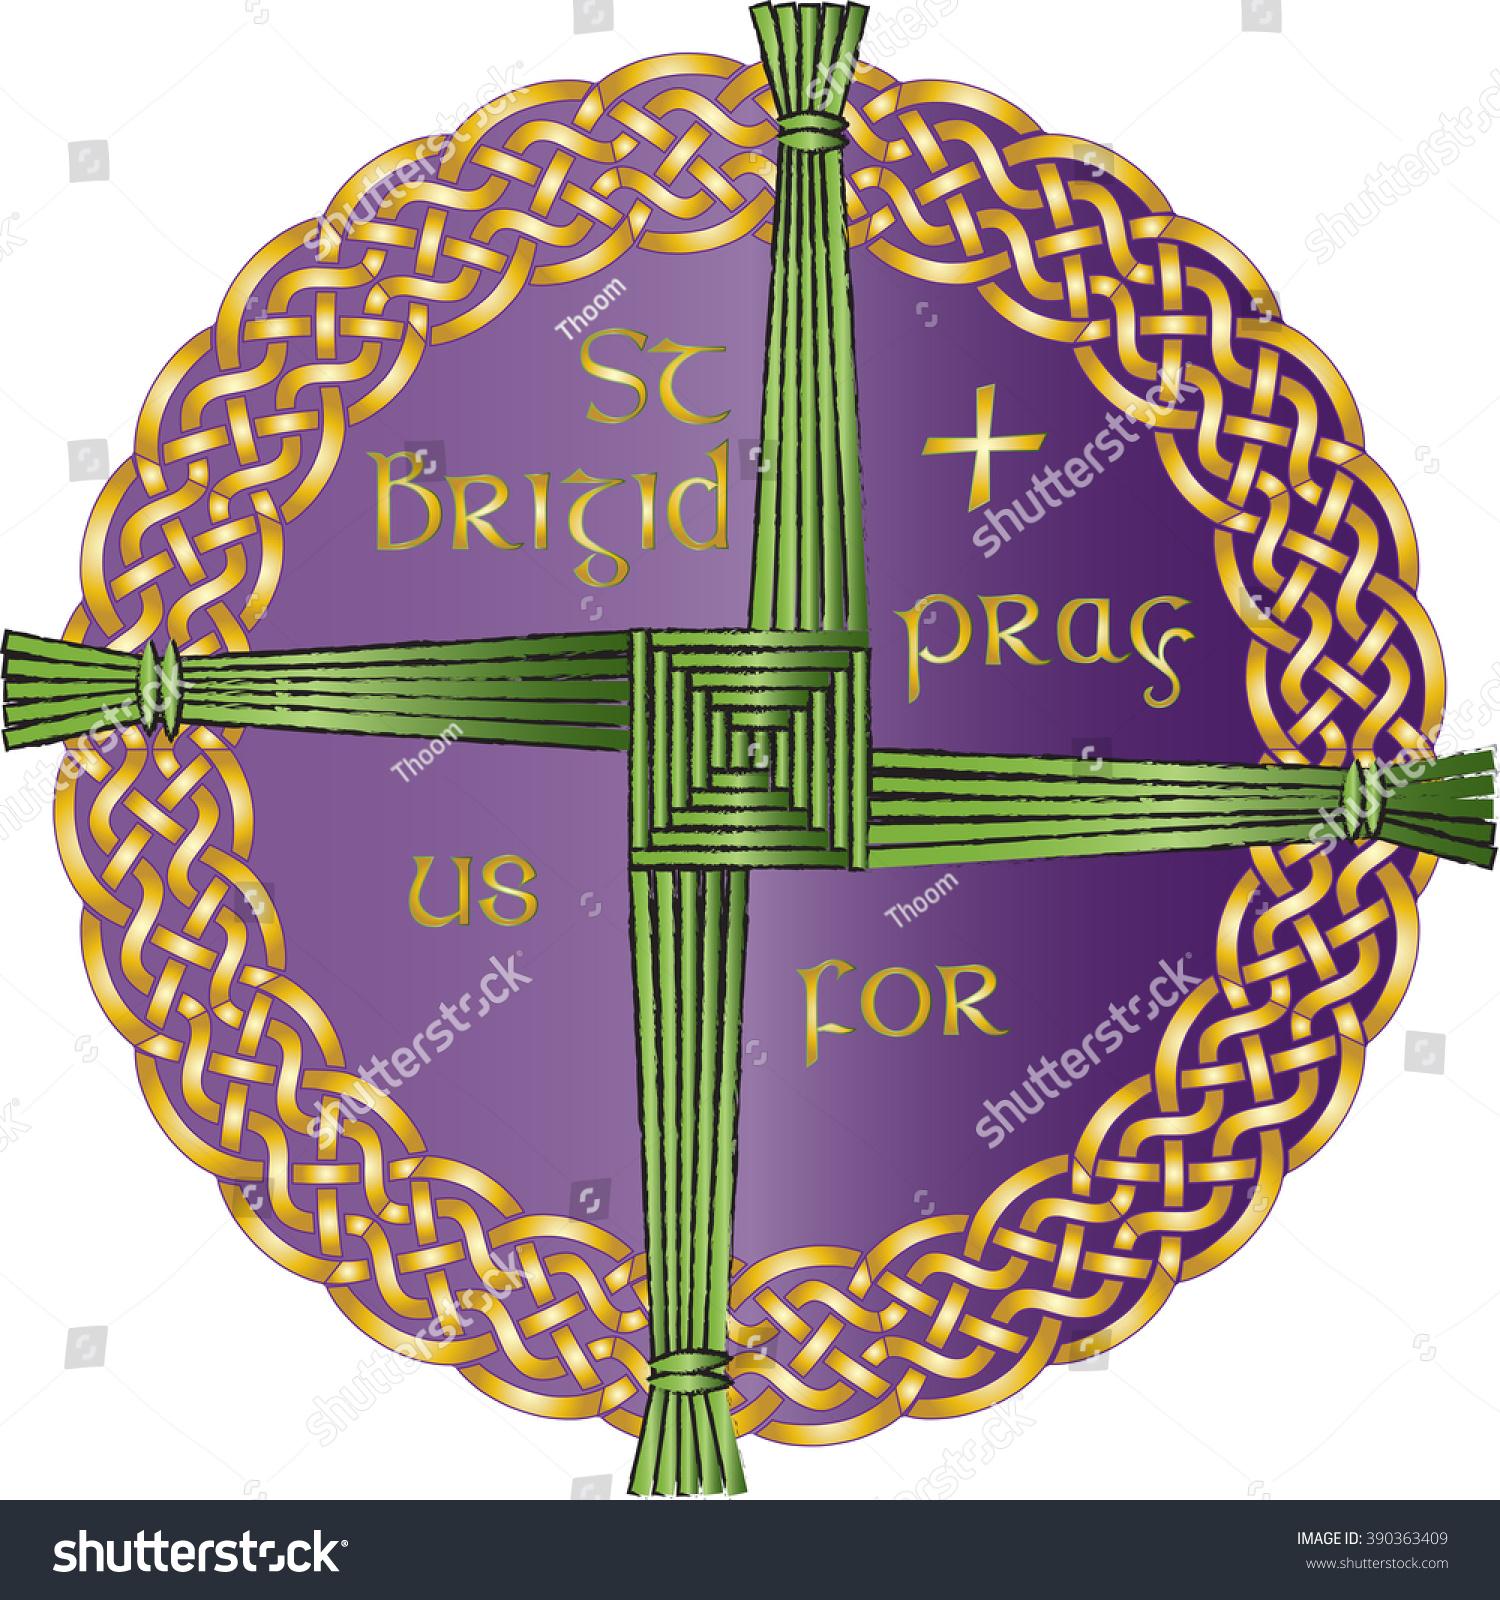 Irish celtic knot ornament cross st stock vector 390363409 irish celtic knot ornament with the cross of st brigid believed to protect against evil biocorpaavc Gallery